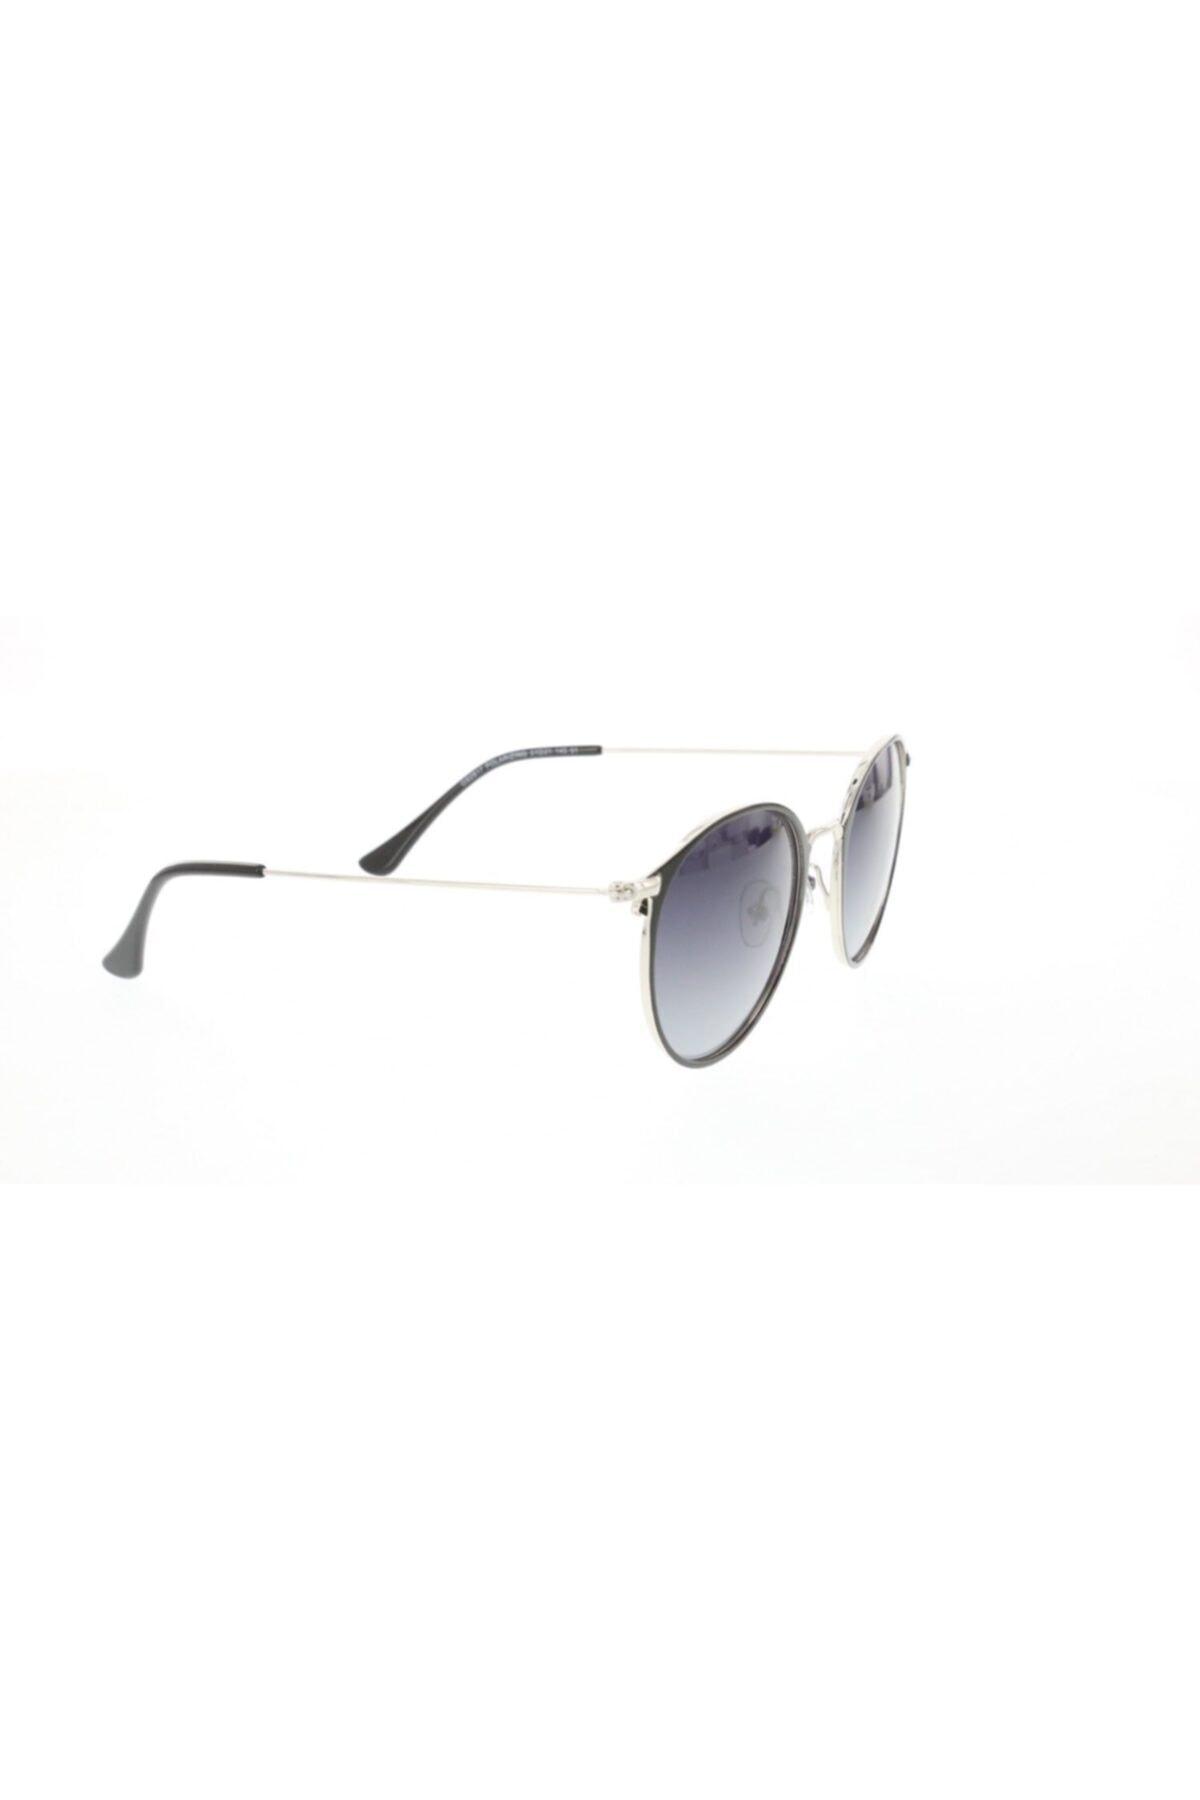 سفارش انلاین عینک آفتابی اسپرت ساده برند Osse رنگ مشکی کد ty4947142